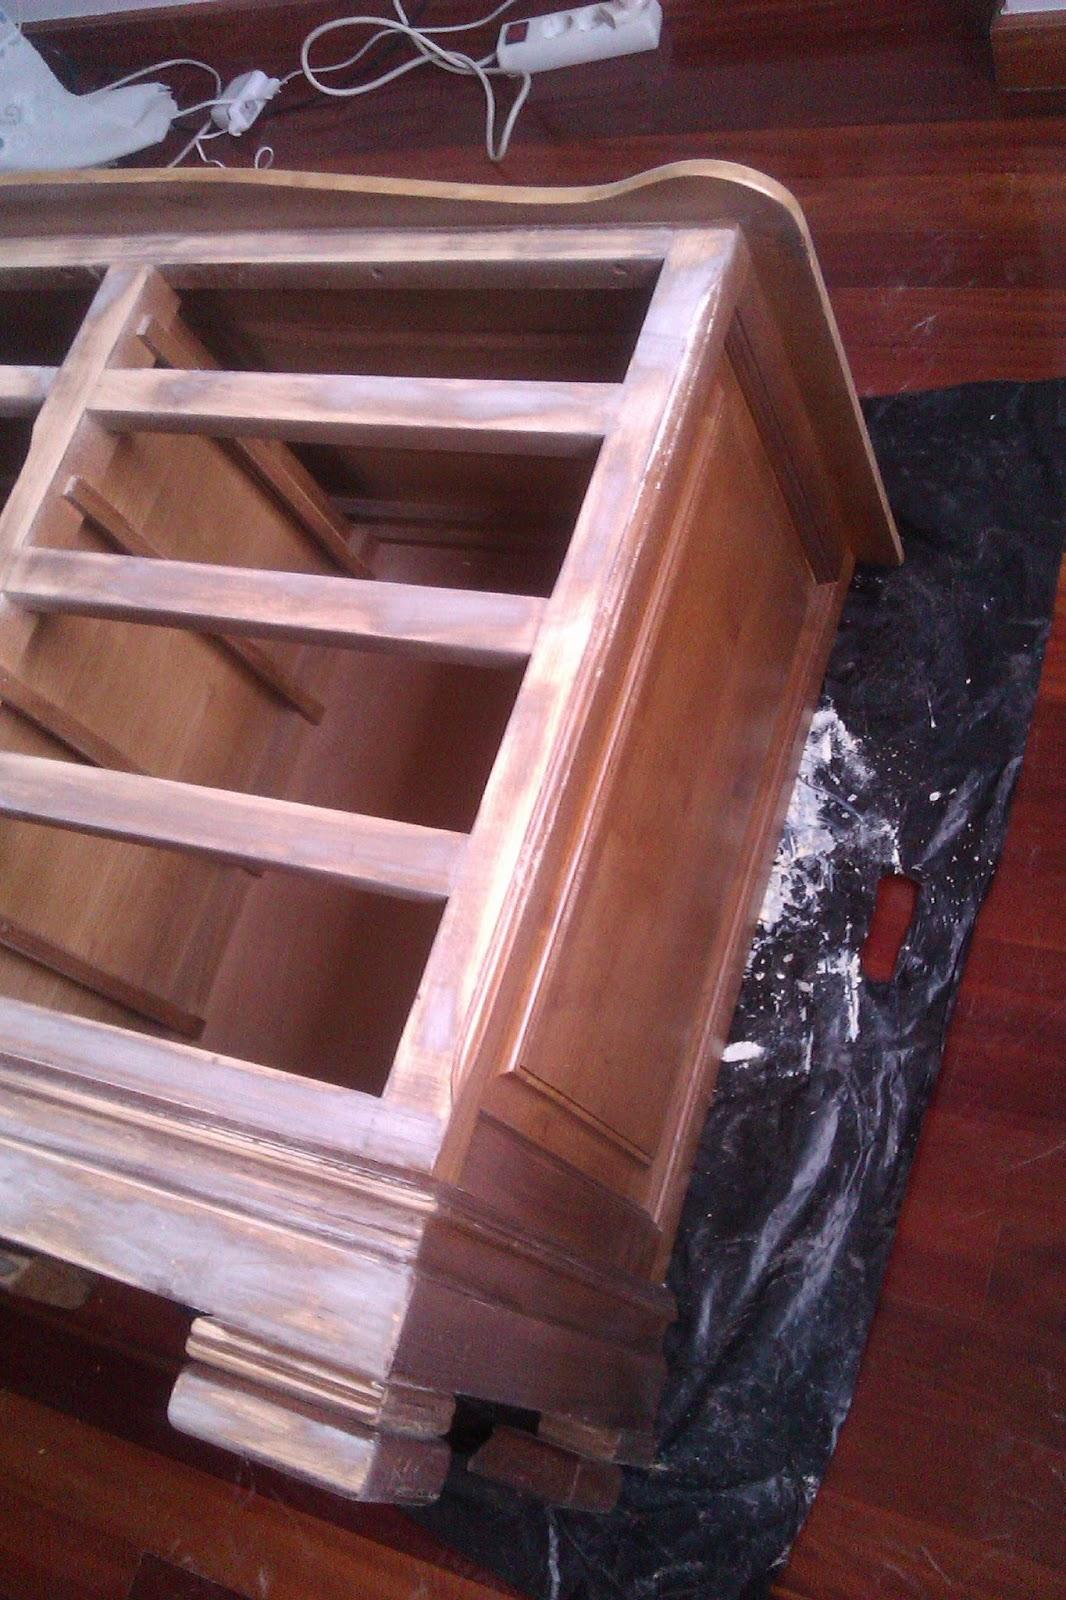 Decoraconmar a mesa estudio madera casta o cambio de look Madera de castano